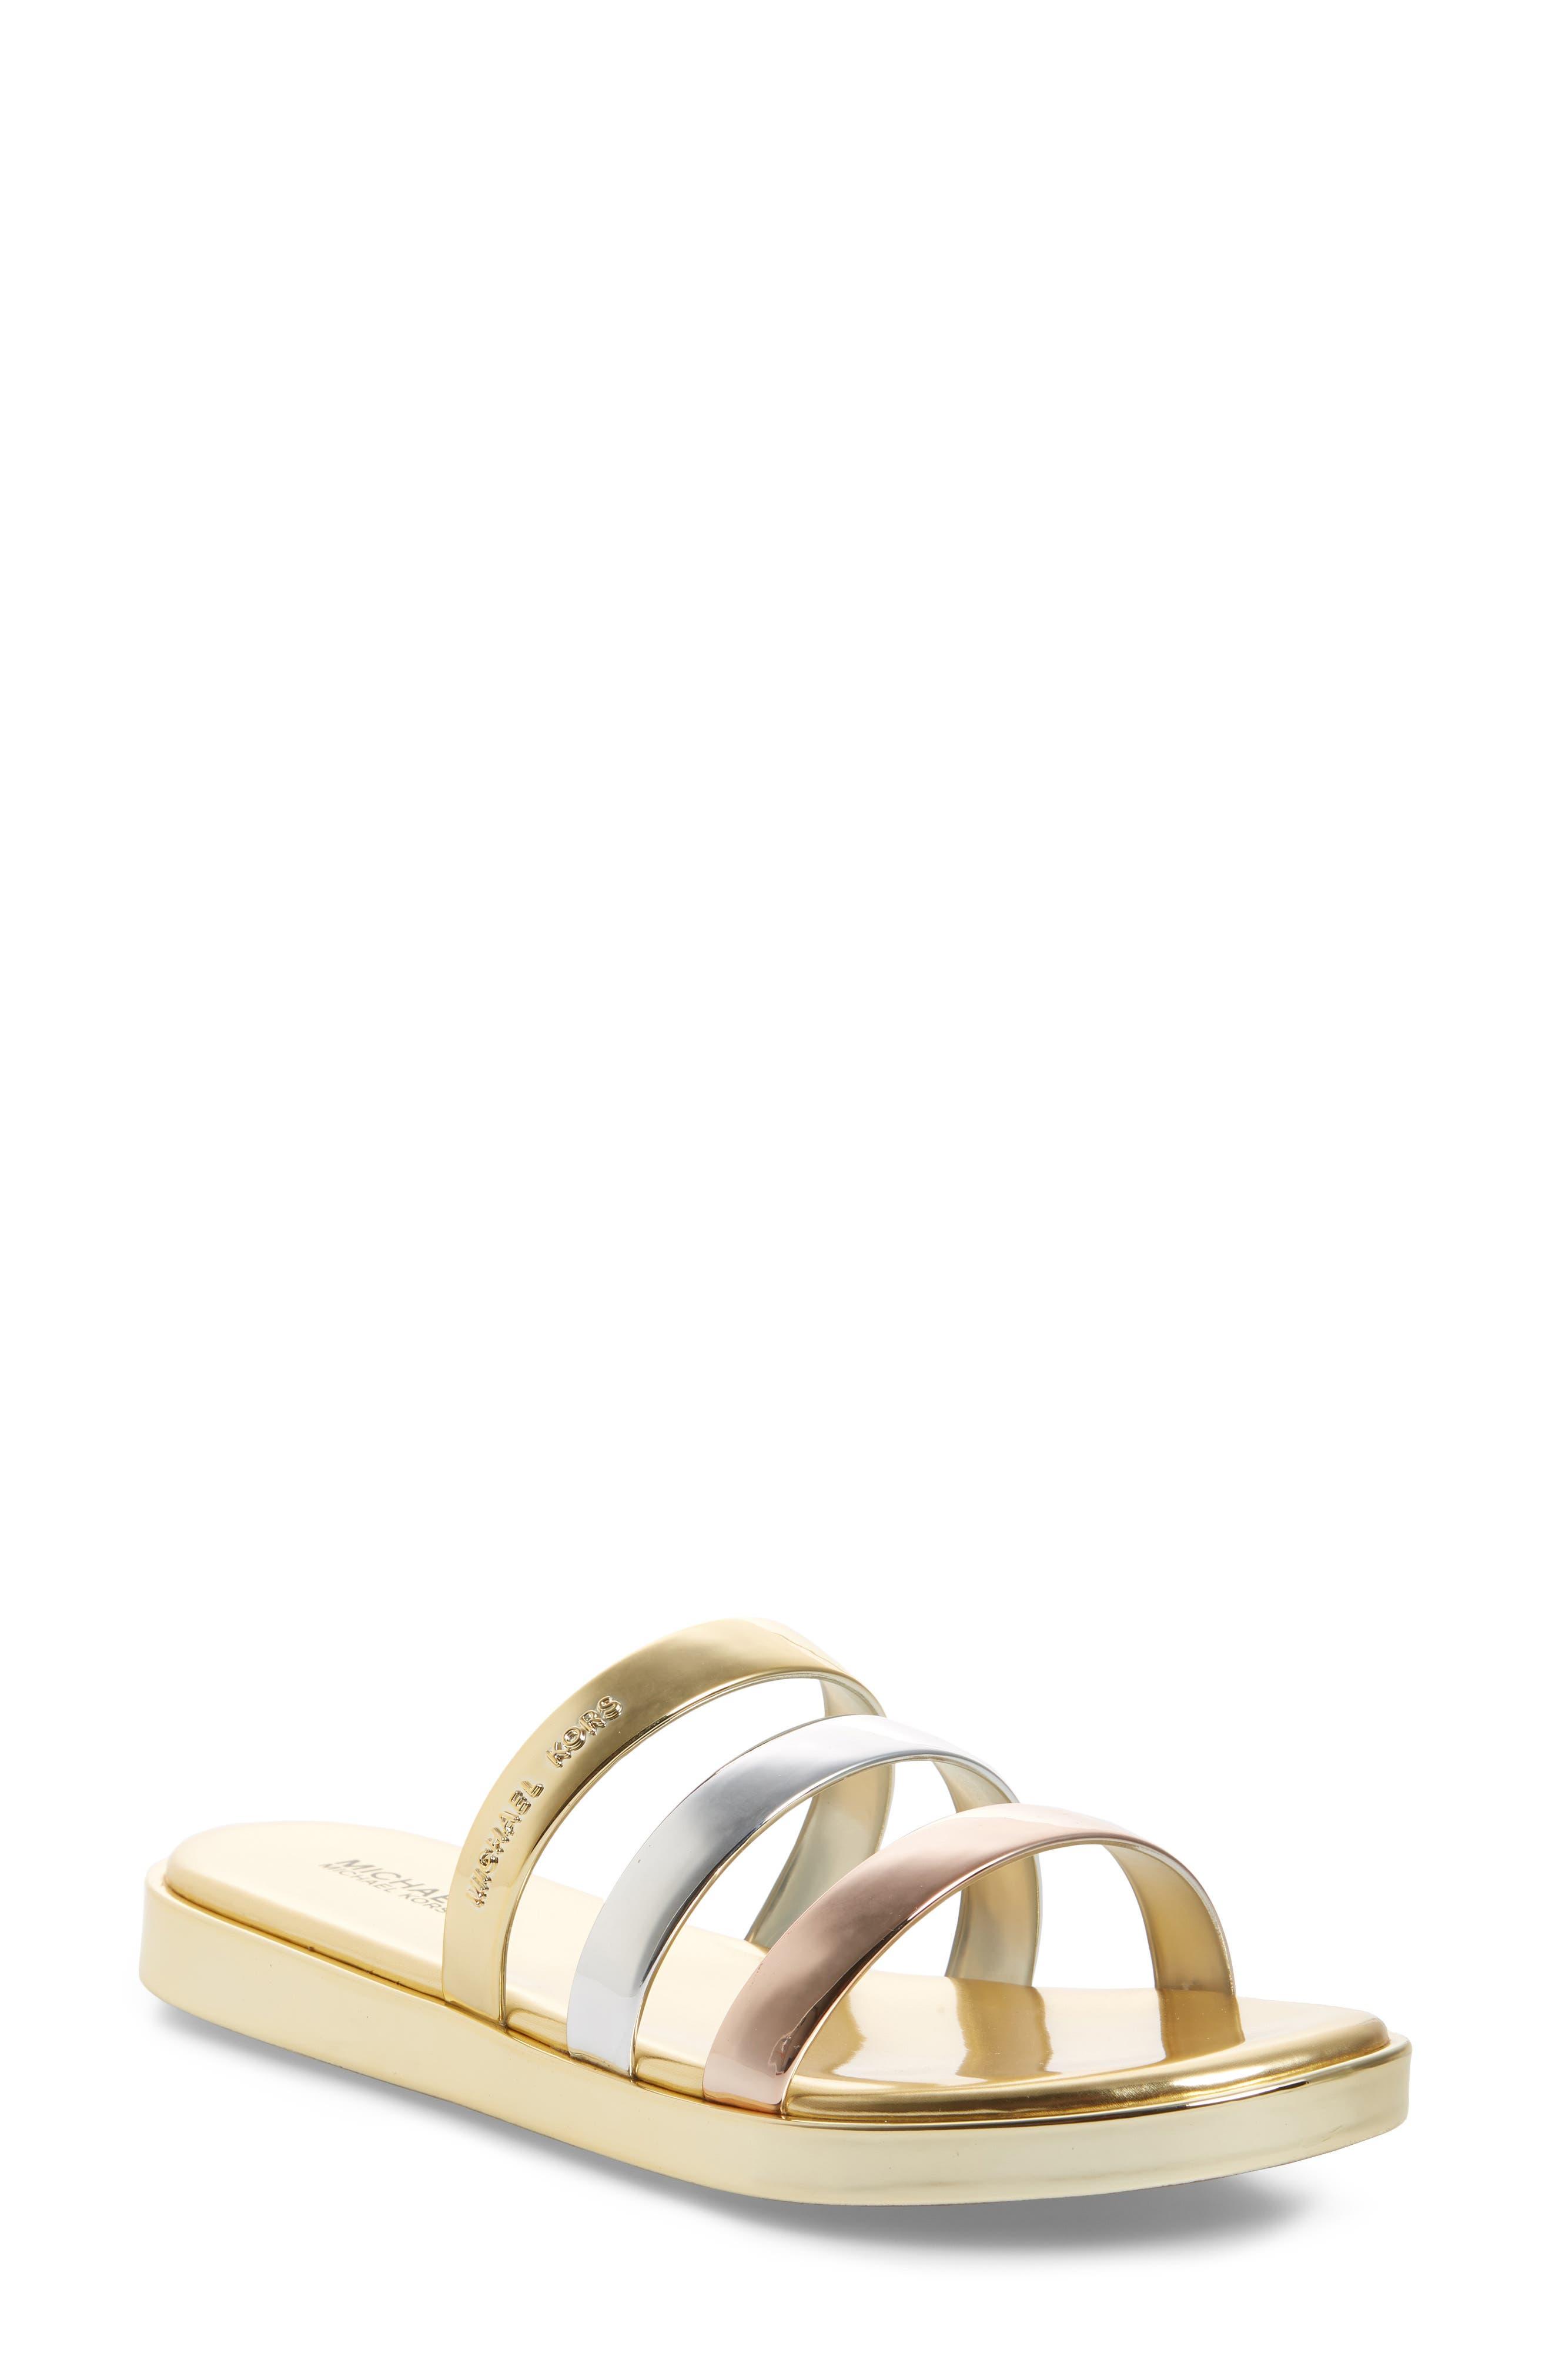 Keiko Triple-Band Slide Sandal,                             Main thumbnail 1, color,                             Gold/ Silver